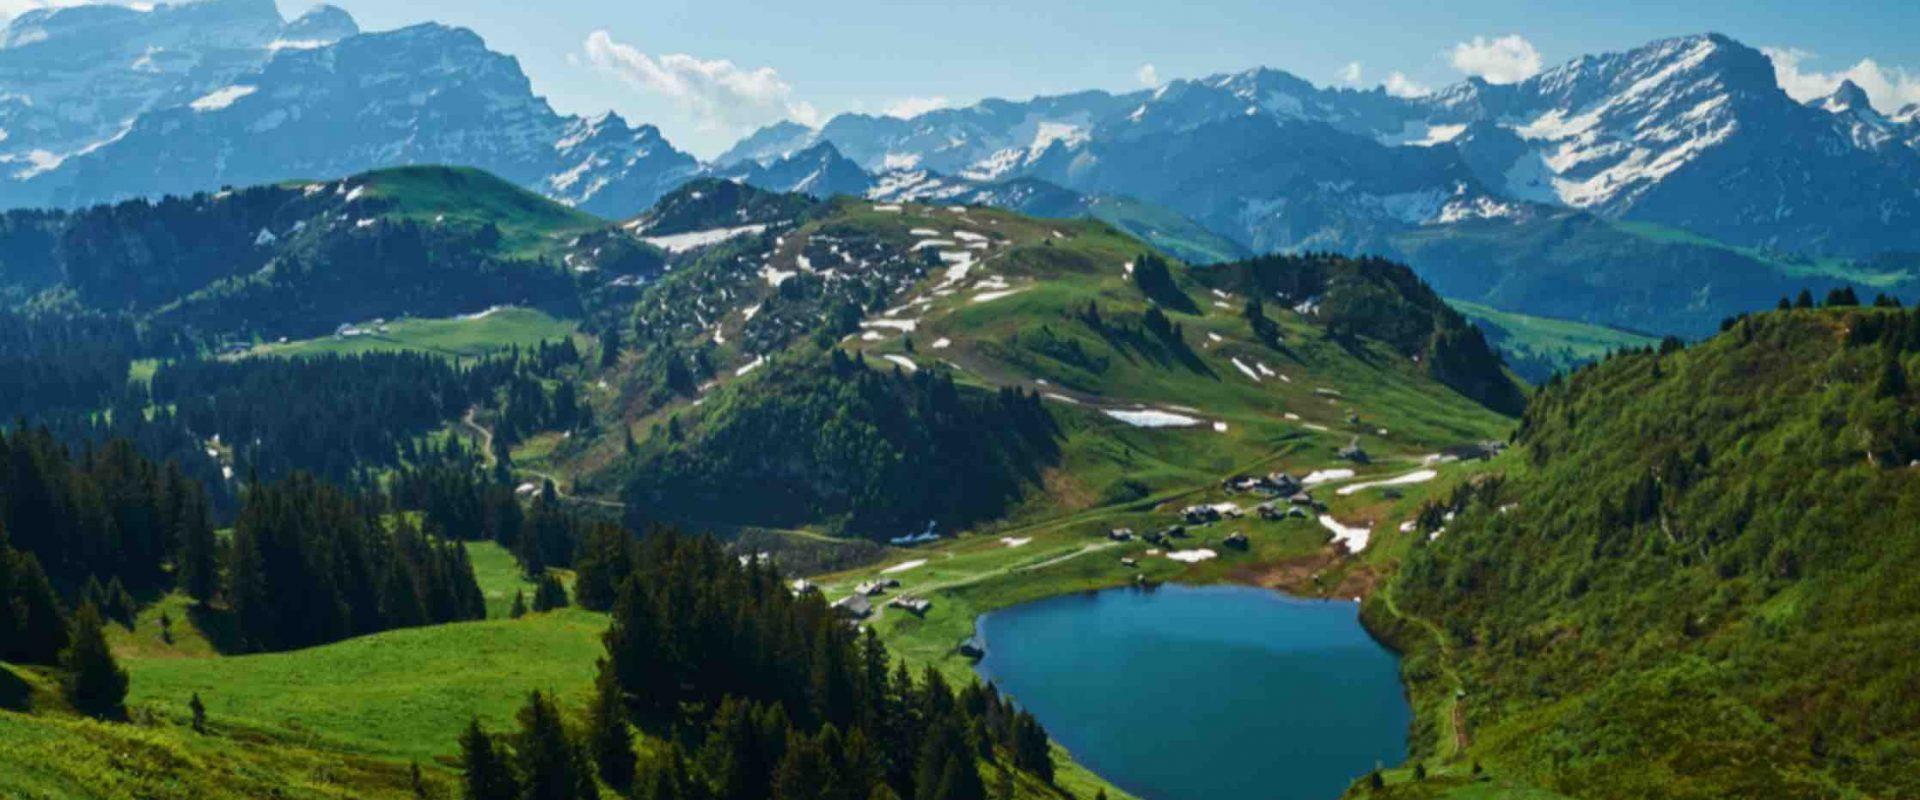 Countryside near Villars Switzerland